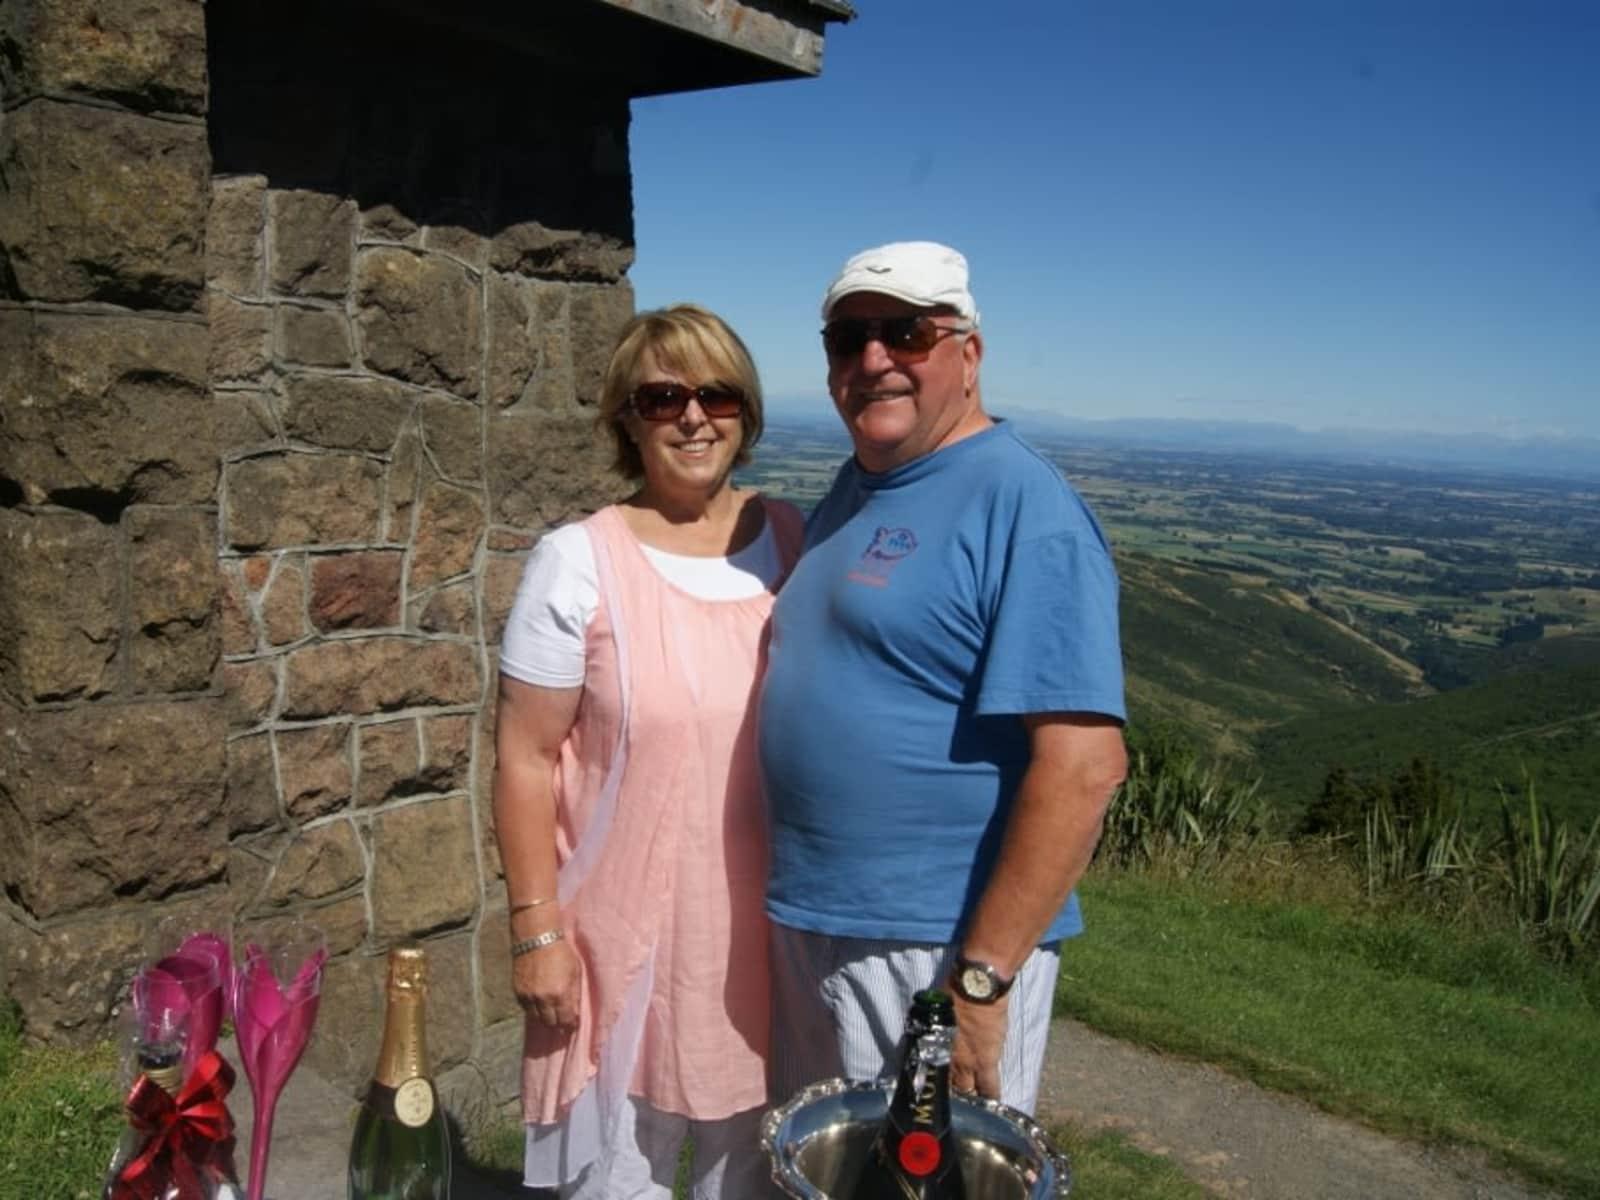 Marilyn & Graeme from Christchurch, New Zealand